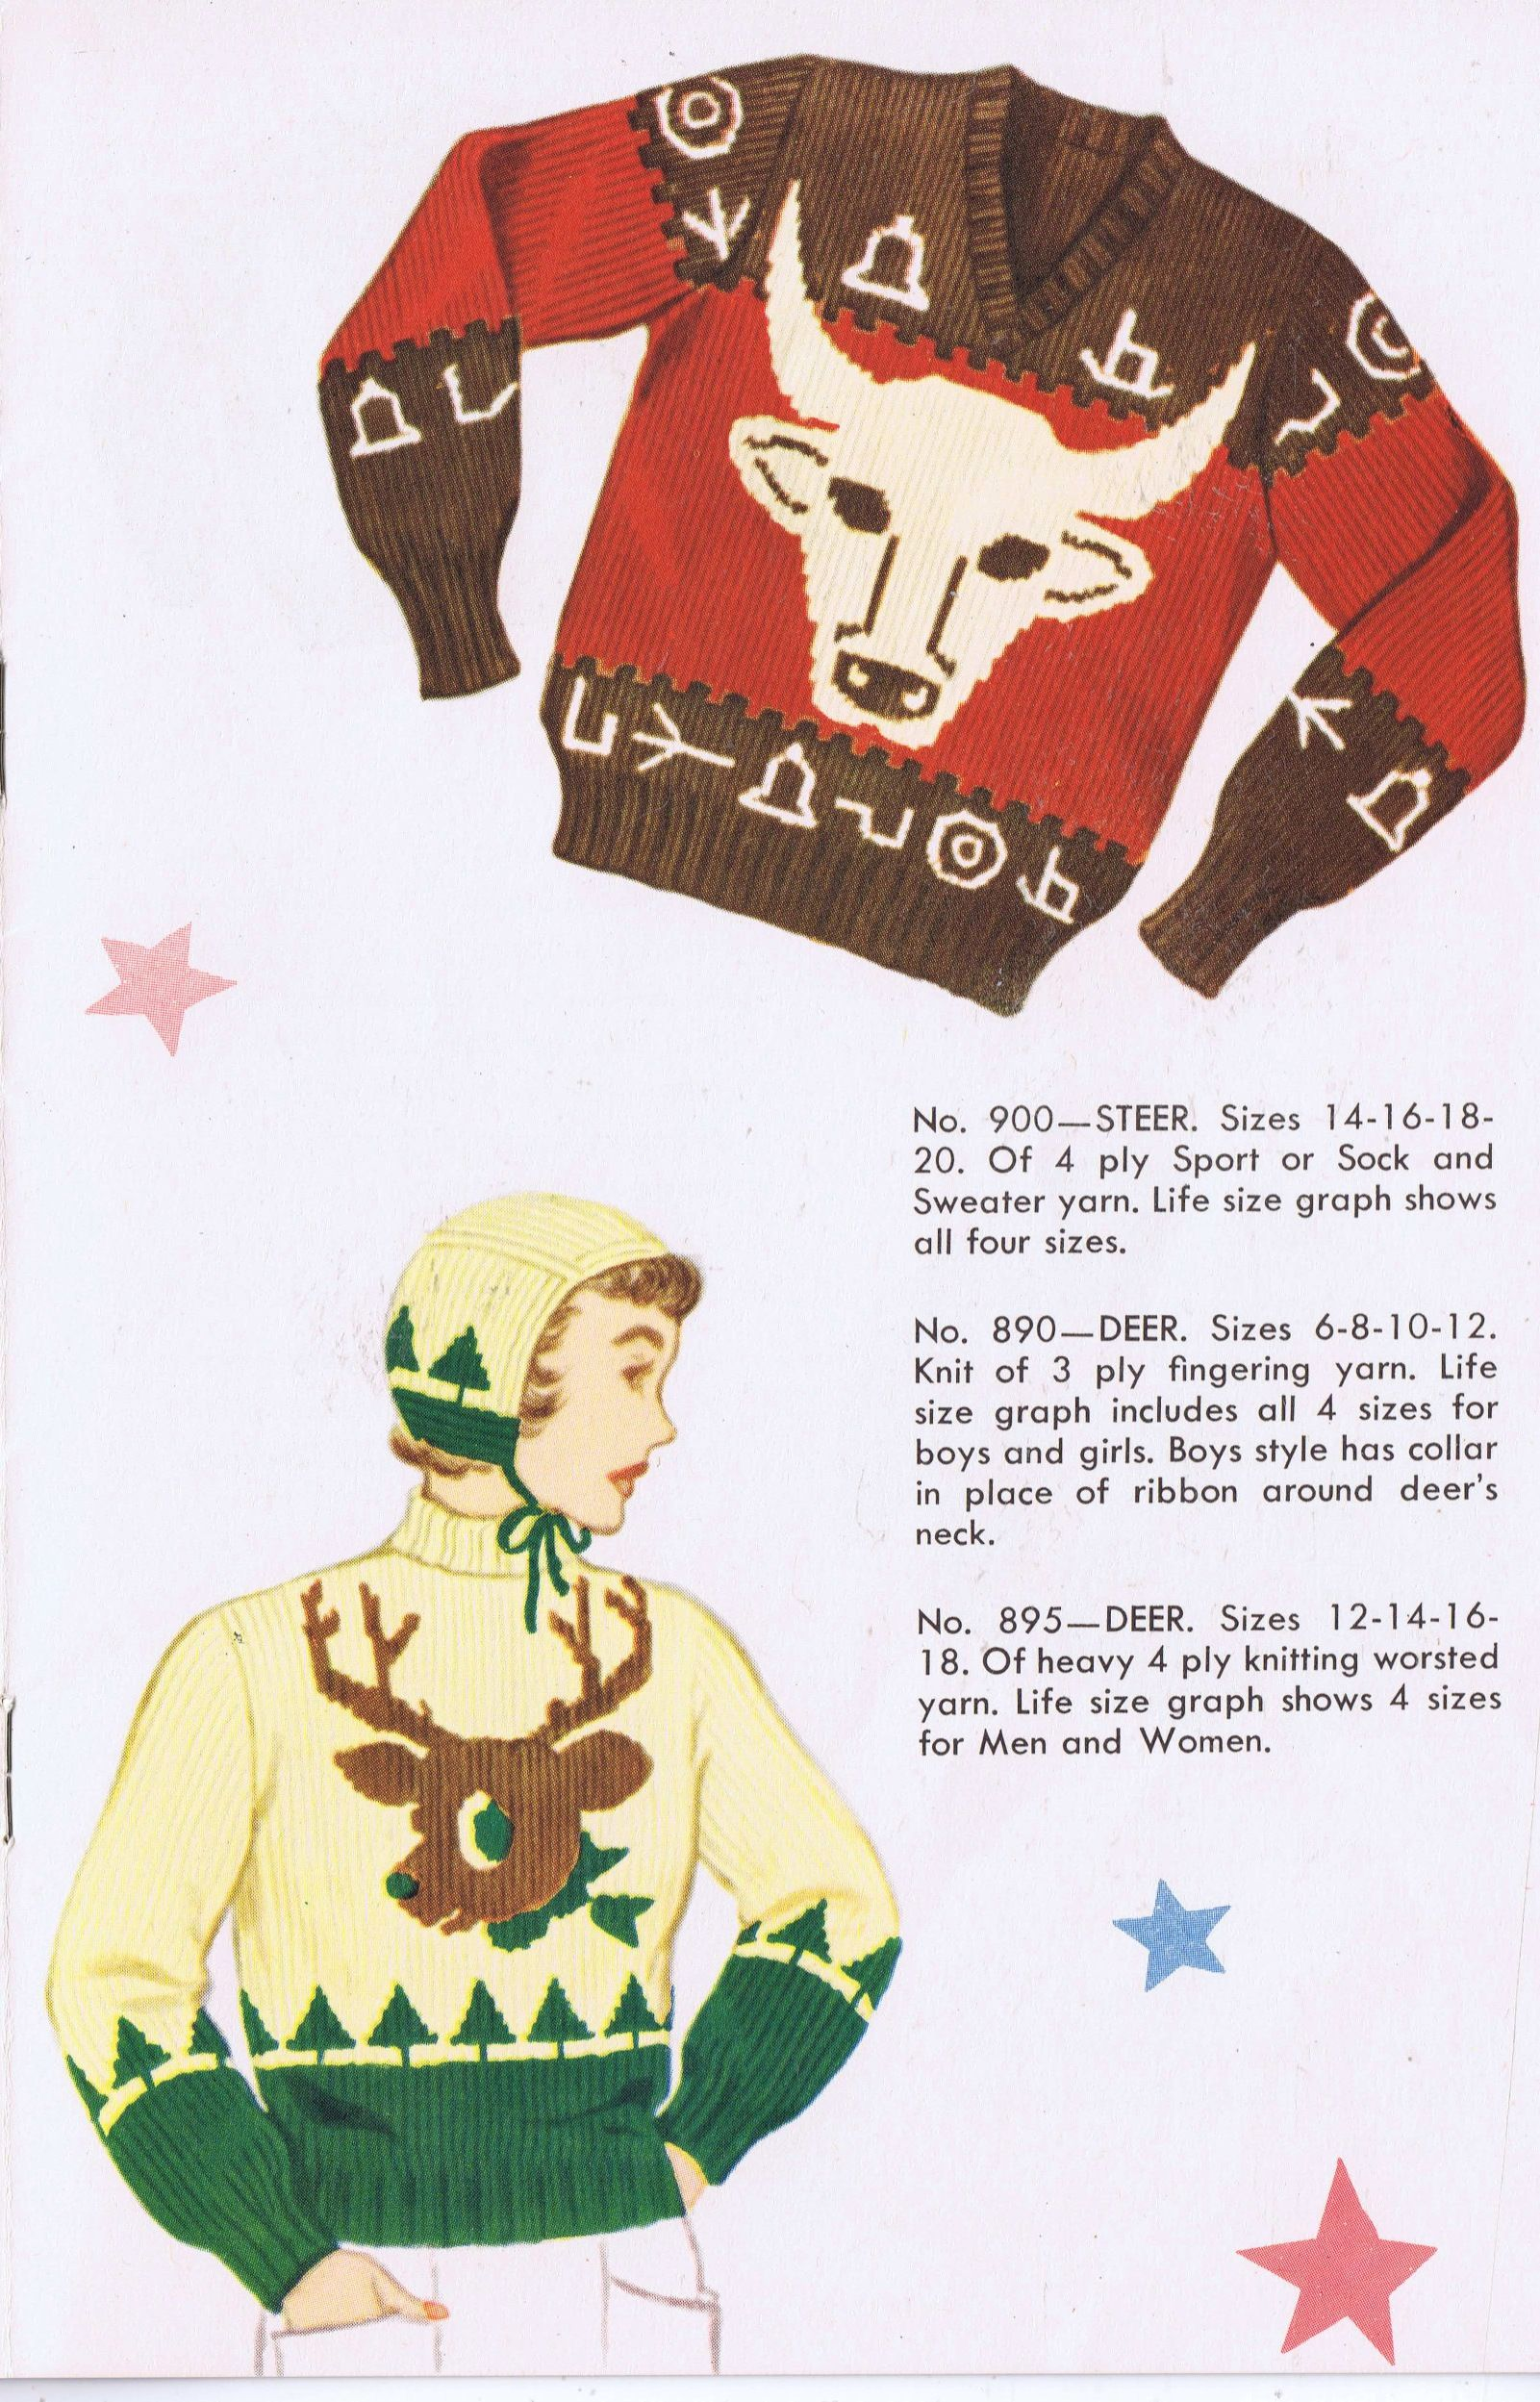 Page 9 of a 1951 Knit O Graf catalog   Knit O Graf - Knit to Fit ...